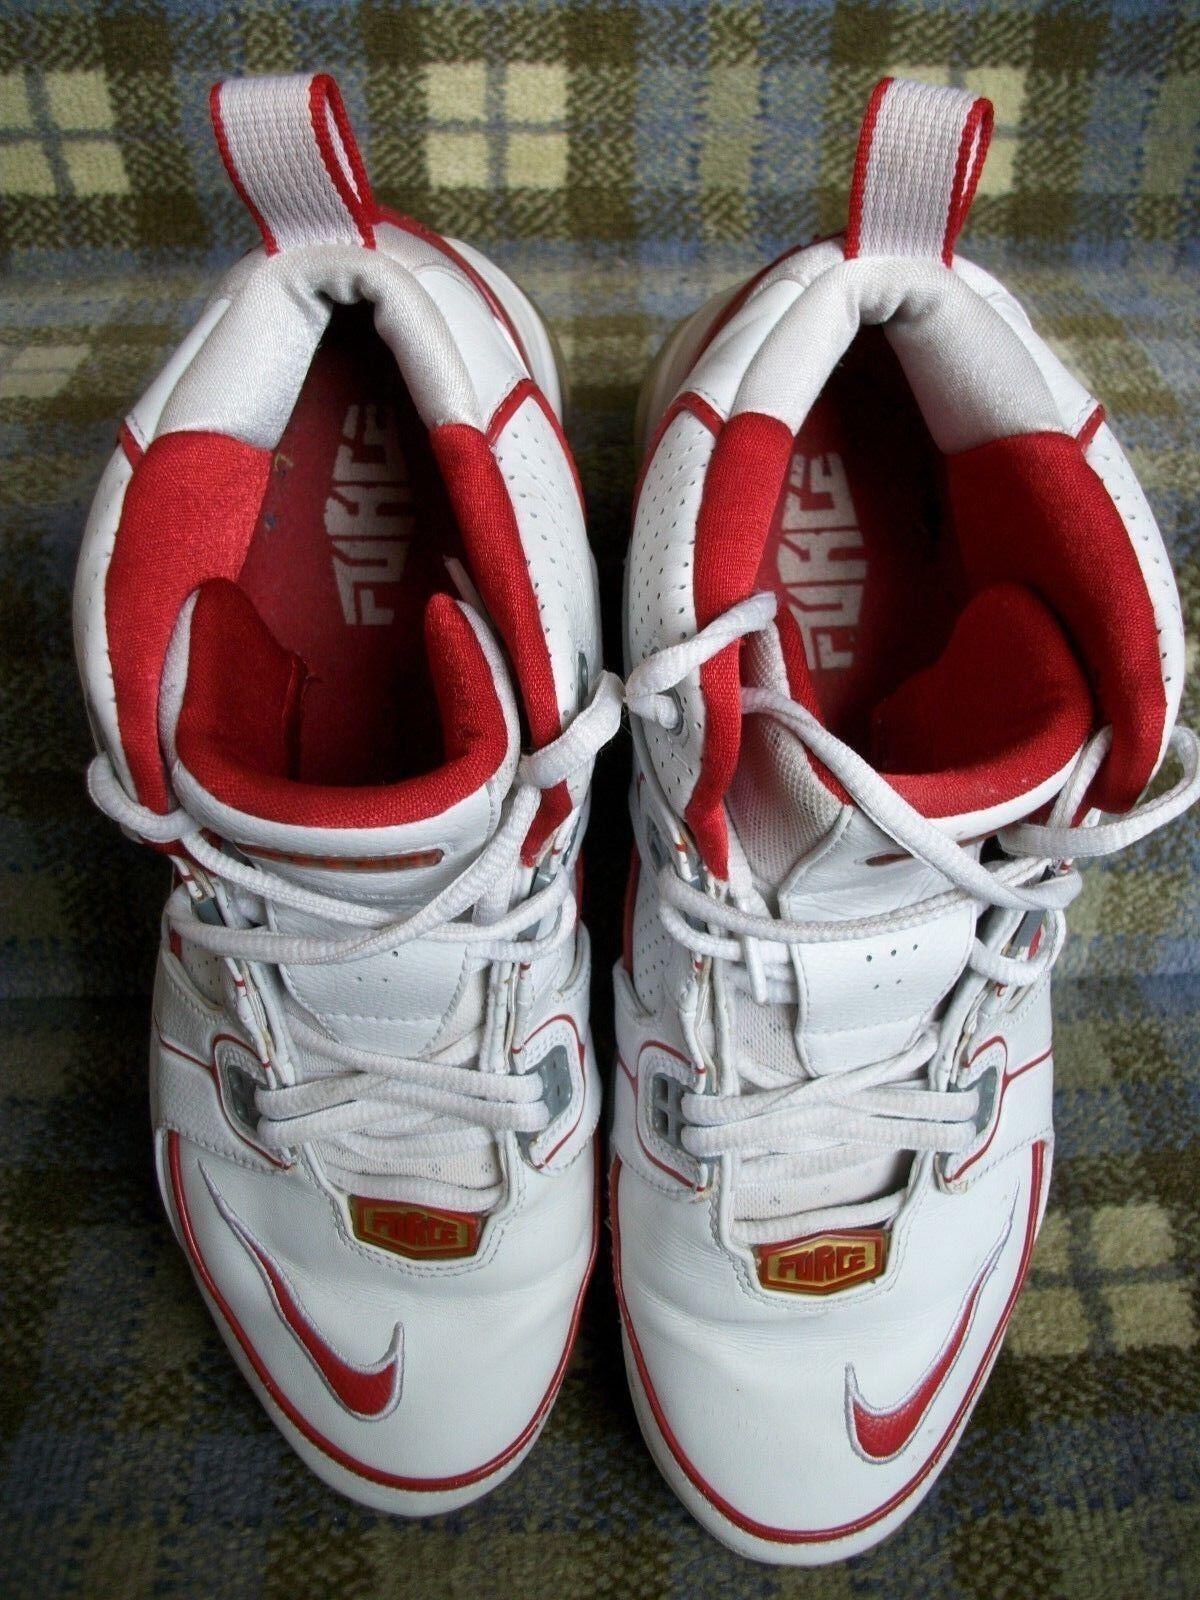 Vintage nike air max totale forza scarpe da basket basket basket   10,5 | Esecuzione squisita  | Uomini/Donna Scarpa  66f91b